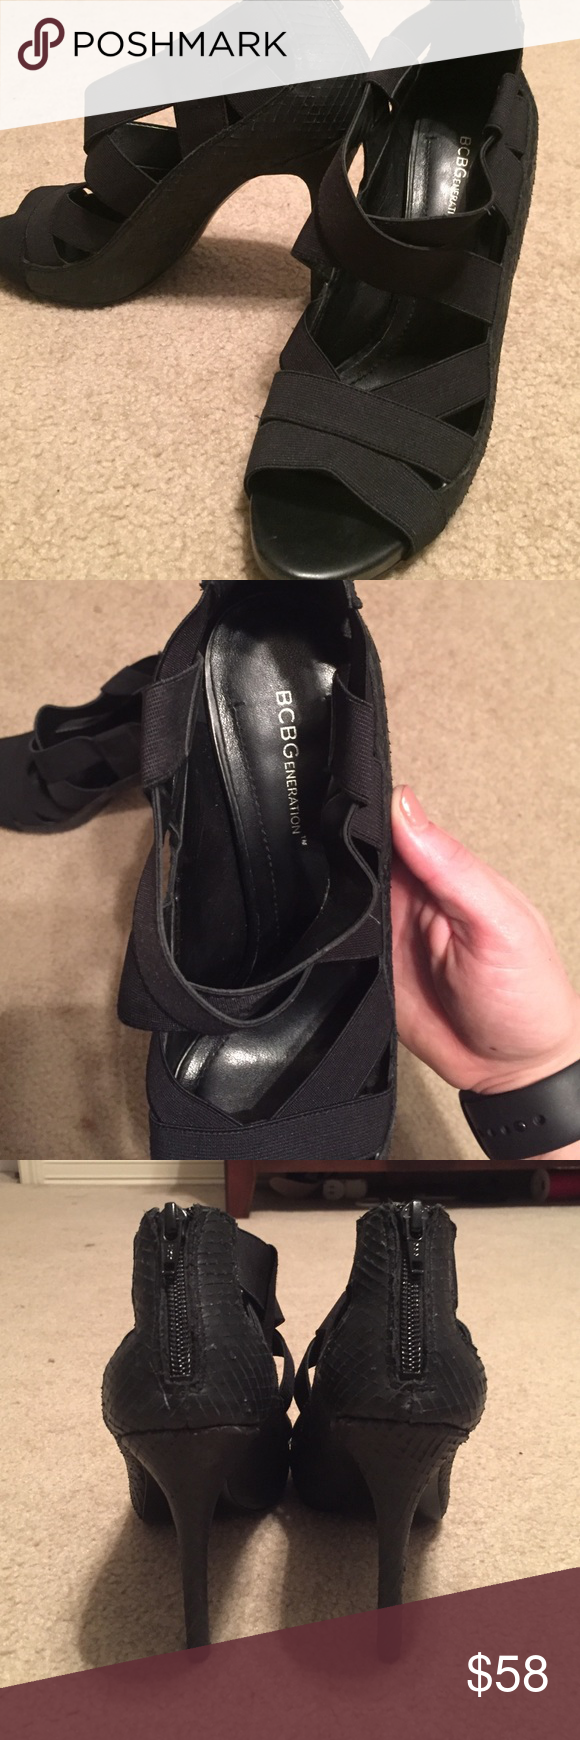 BCBG heels Black BCBG heels. Zipper on back. Straps are elastic. Only worn twice BCBGeneration Shoes Heels